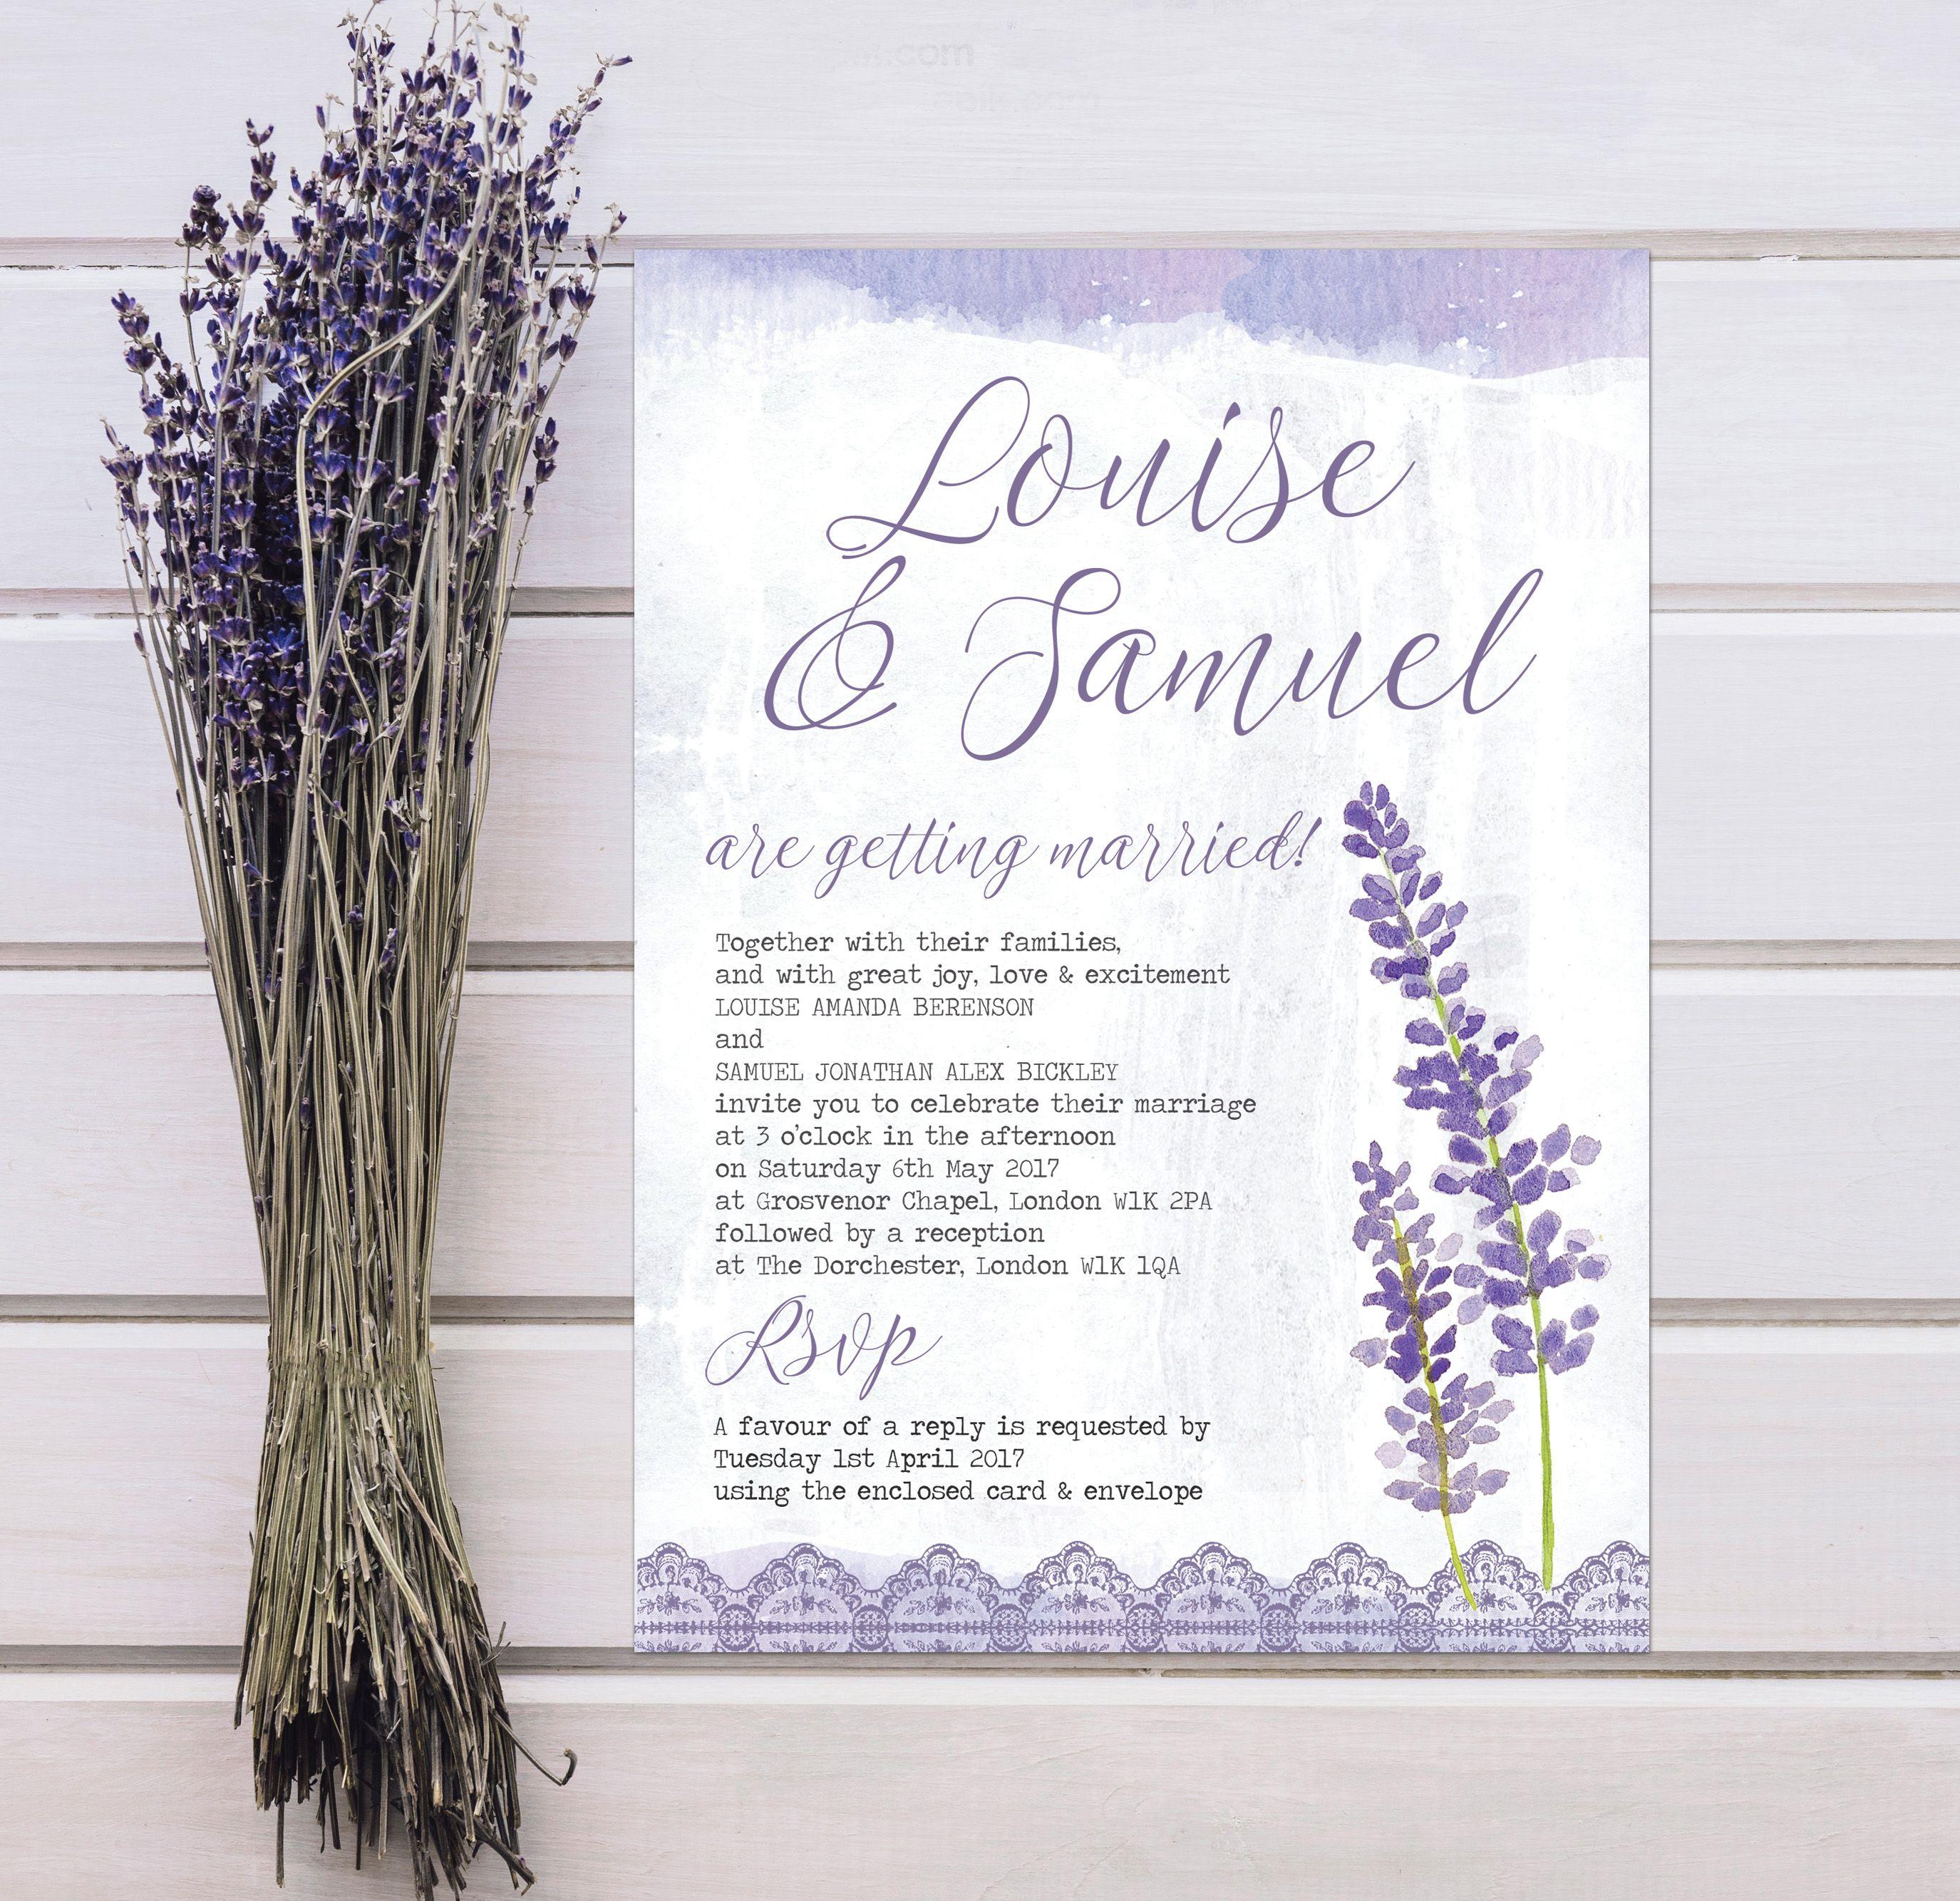 Beautiful Natural Floral Wedding Invitations With Delicate Watercolour Watercolor Laven Lilac Wedding Themes Beautiful Wedding Stationery Wedding Invitations